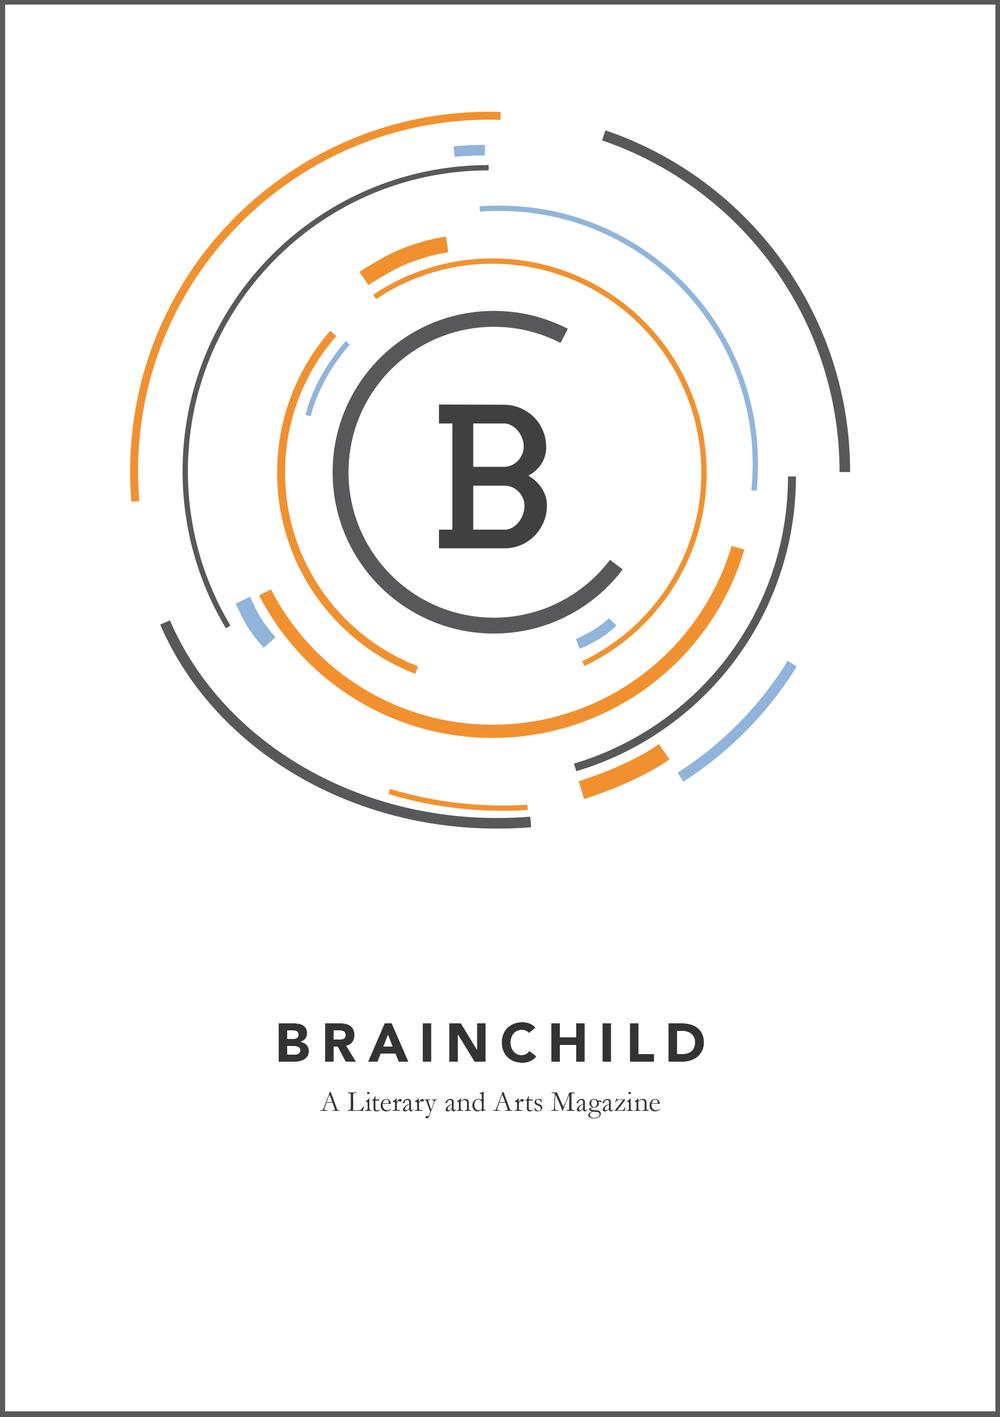 Brainchild 2014